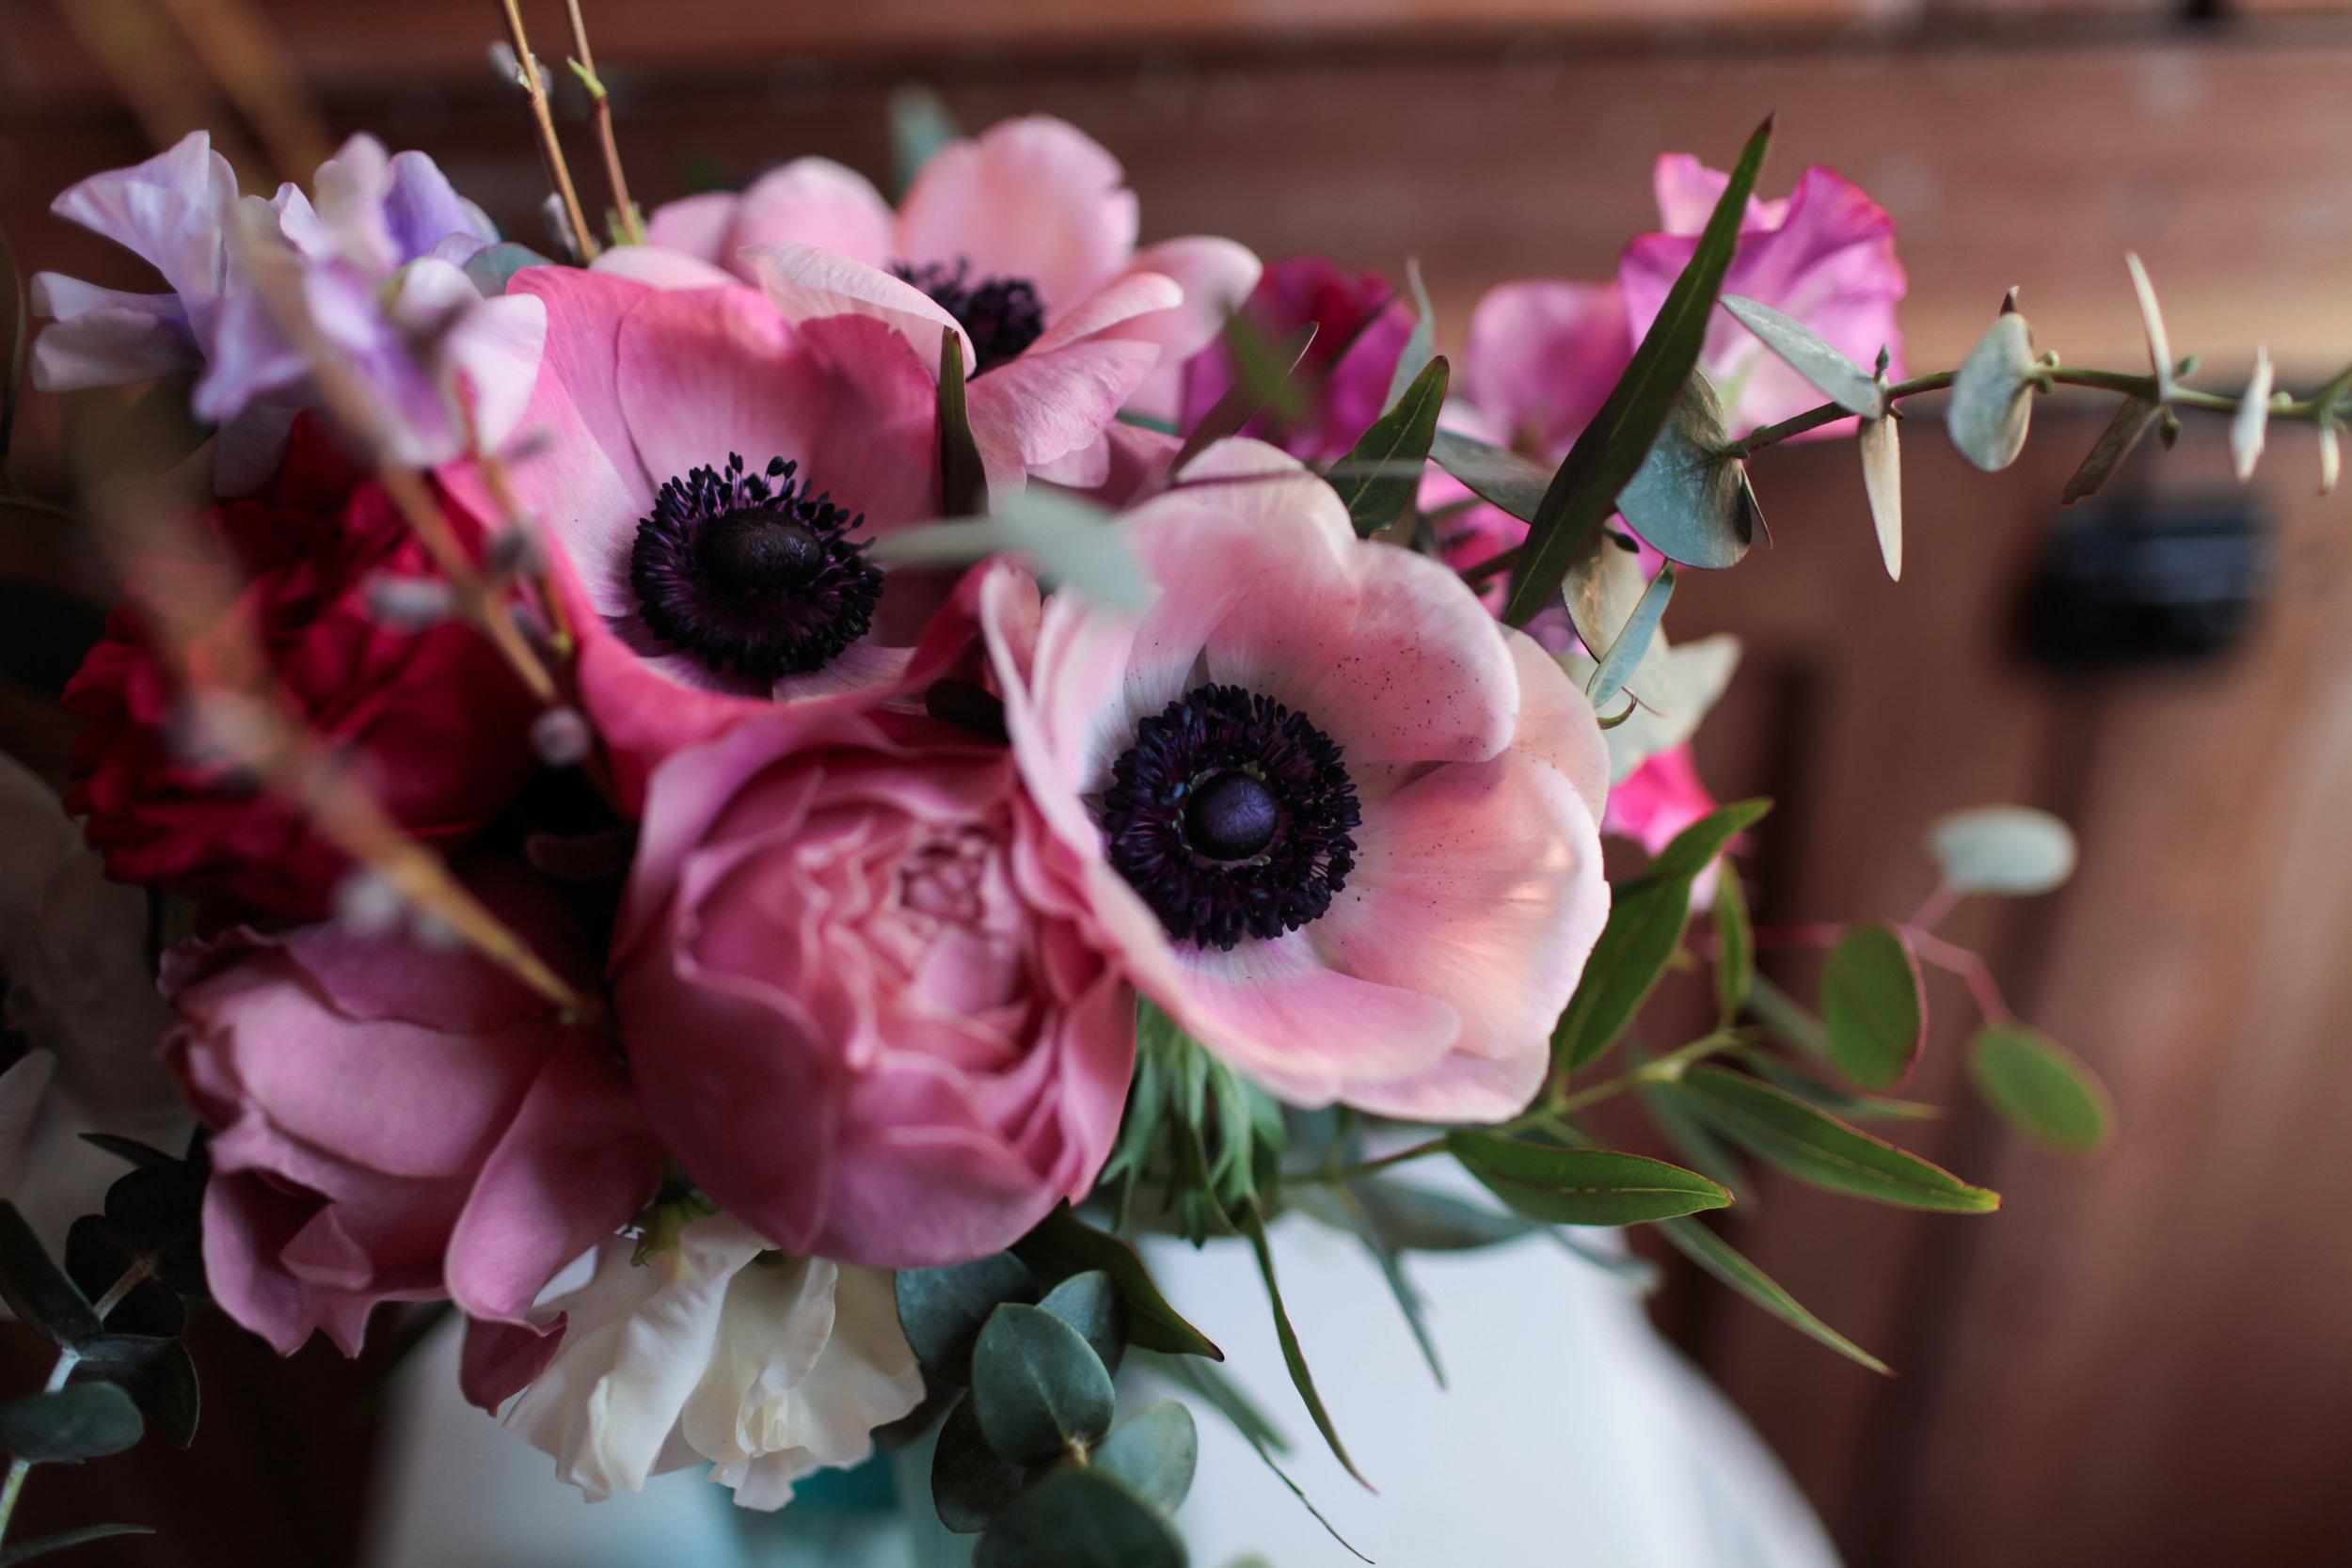 Jackie-valentine-flowers-5.jpg